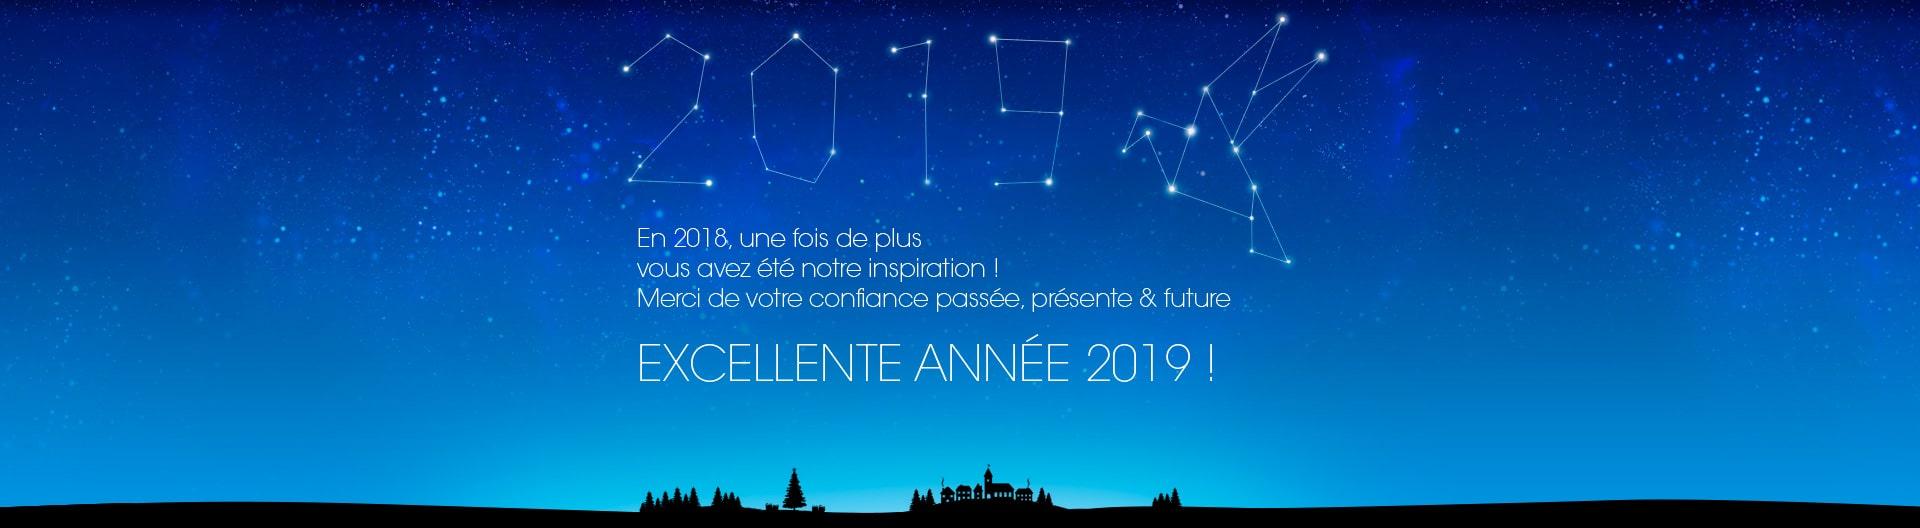 voeux 2019 agence rennes